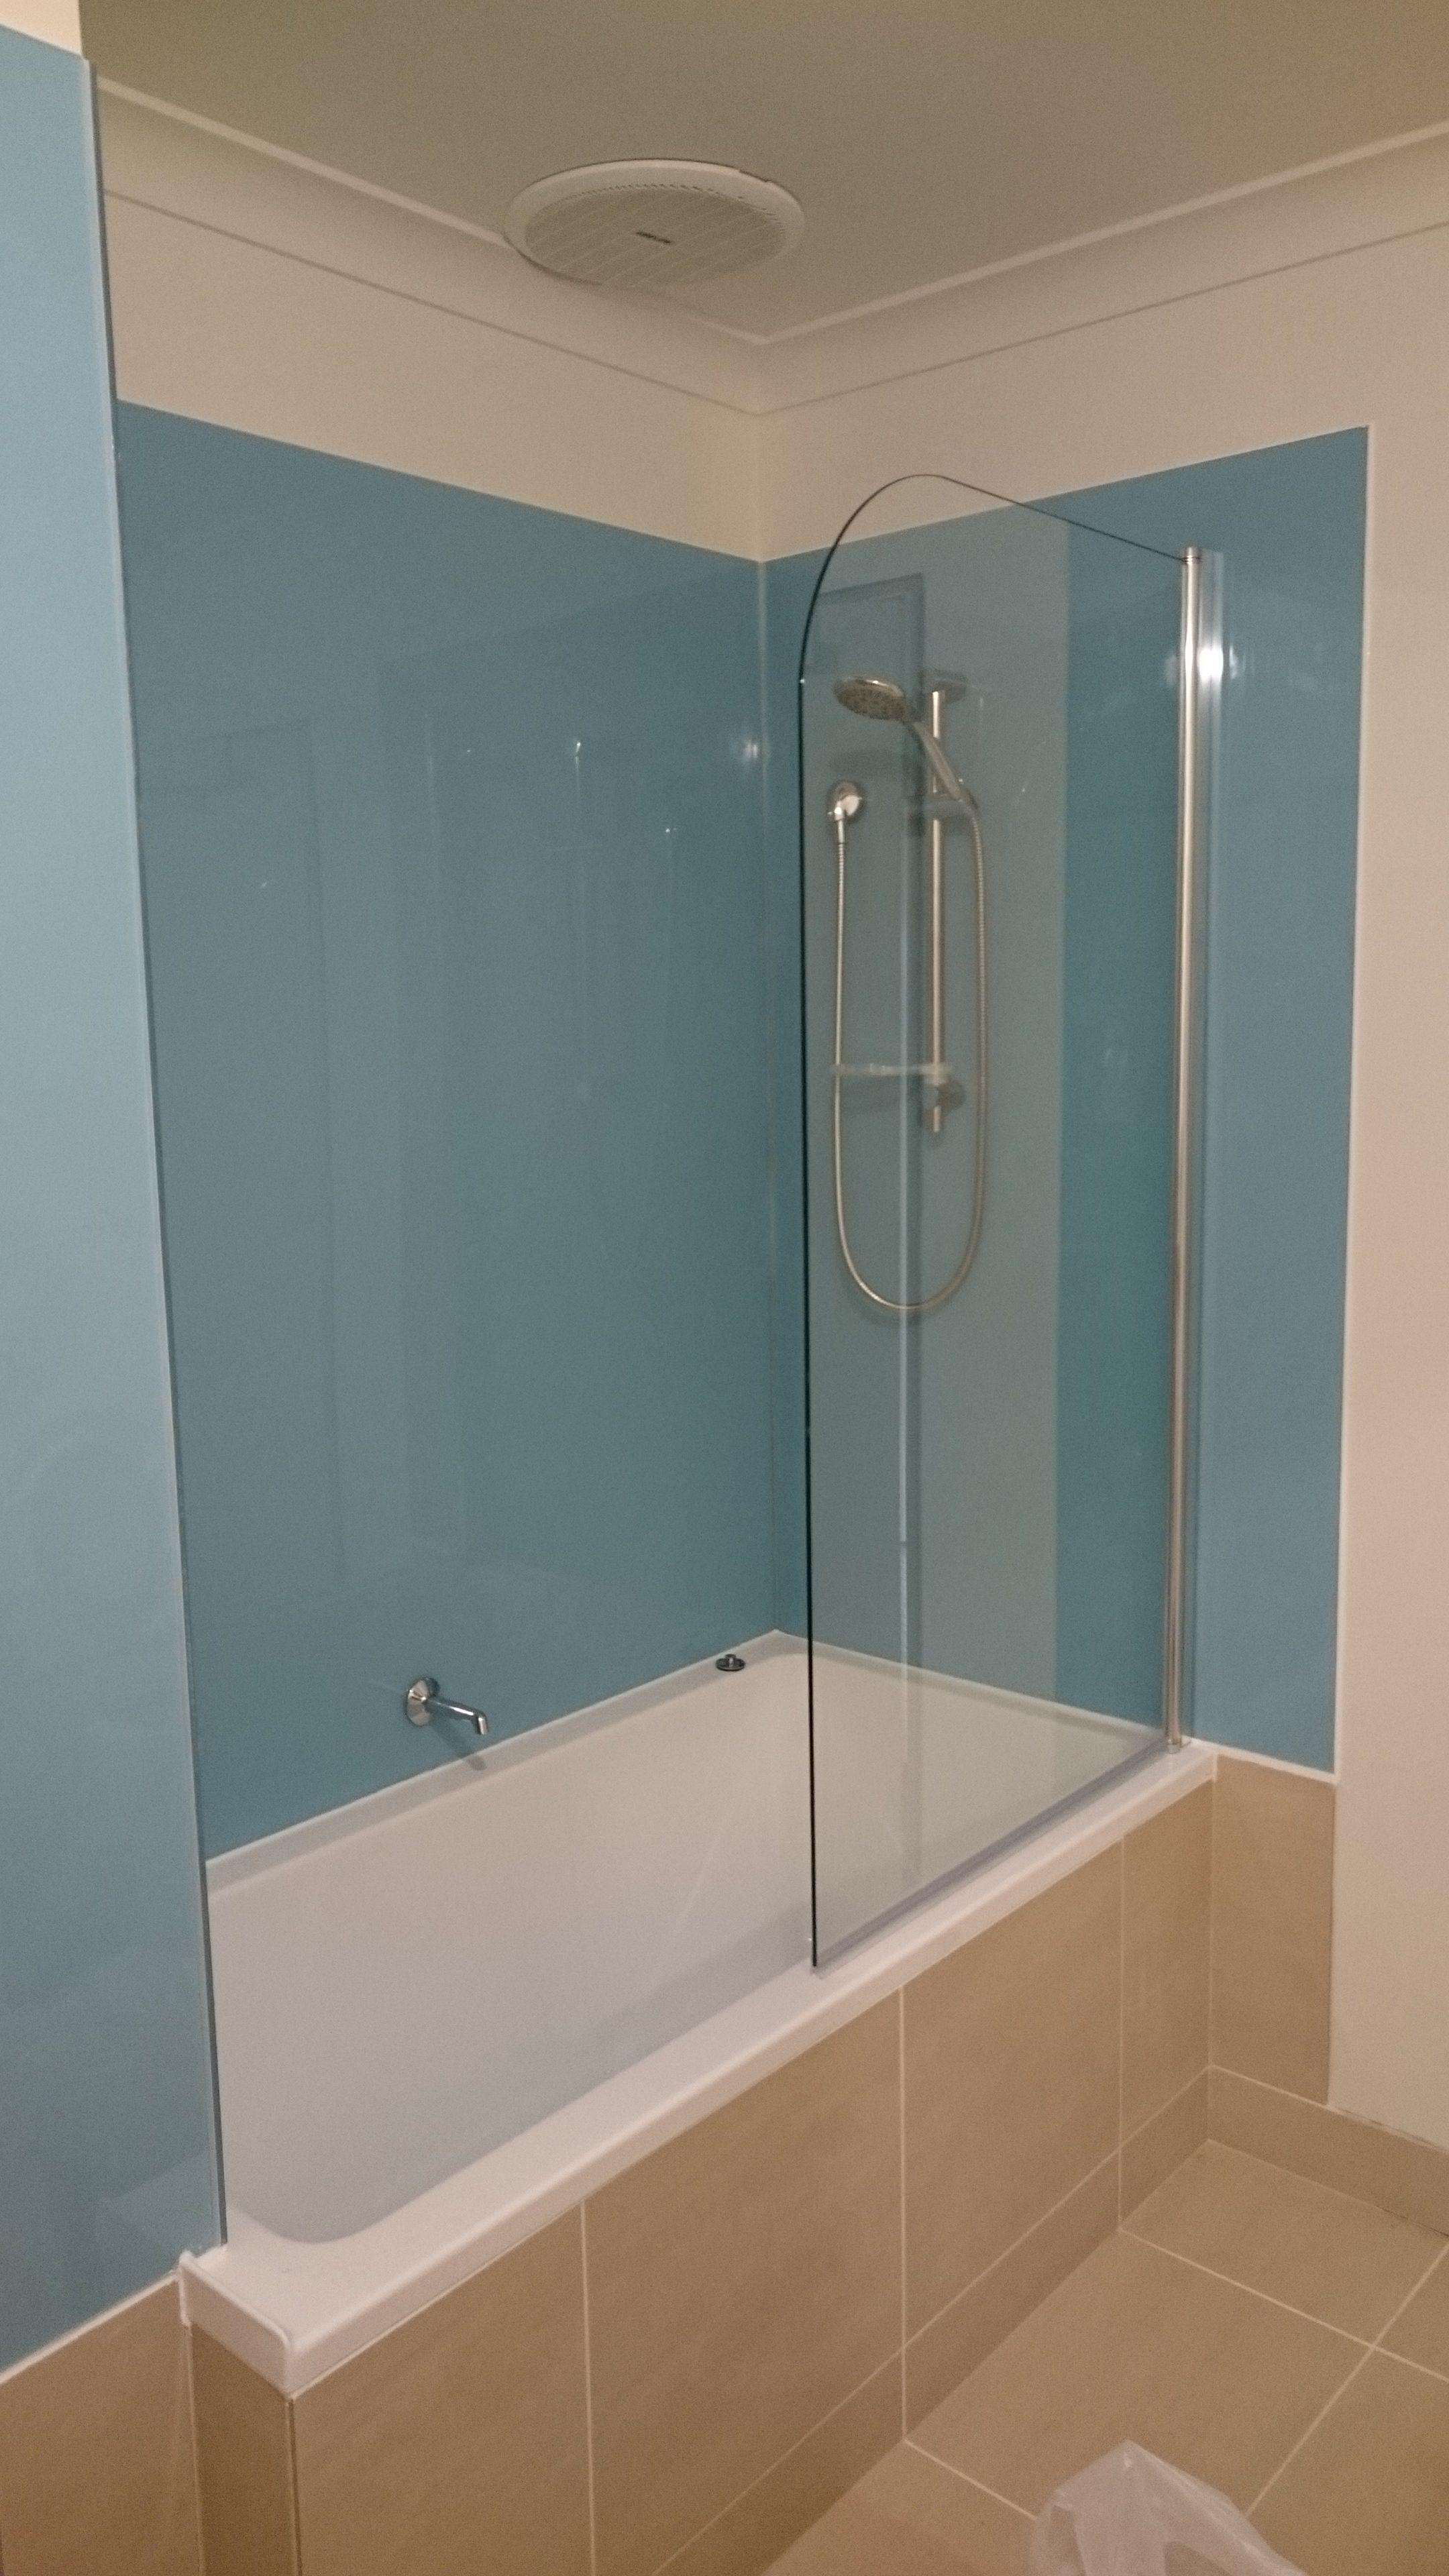 acrylic panels for bathroom walls%0A GLASS COLOUR GLACIER HIGH GLOSS GLASS EFFECT WALL PANELLING FOR SHOWER WALLS  KITCHEN SPLASH BACKS by LUSTROLITE  http   www amazon co uk dp B   UZU u